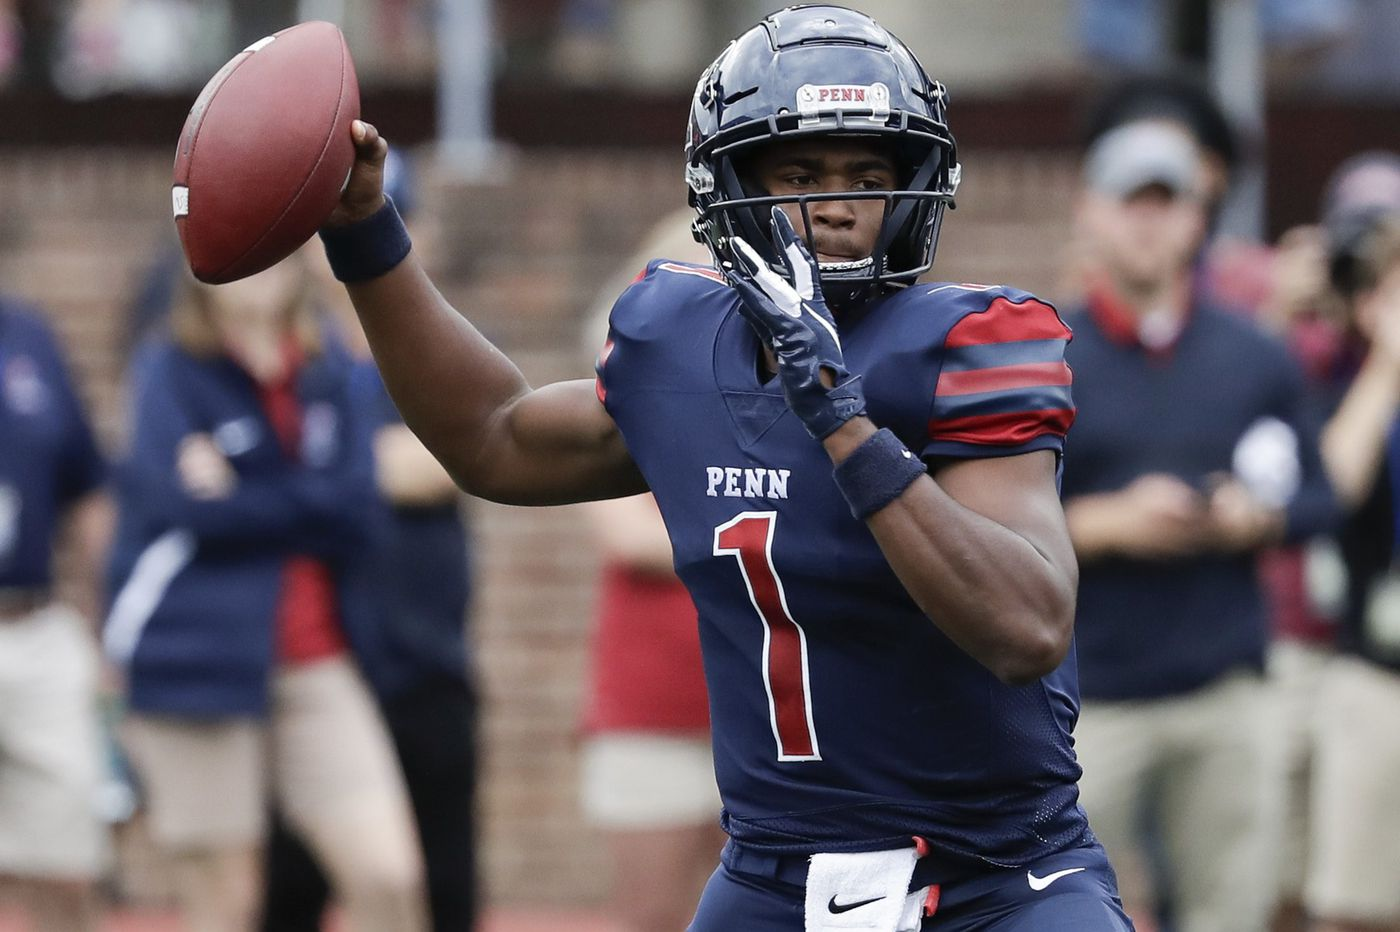 Penn beats Columbia despite red-zone struggles